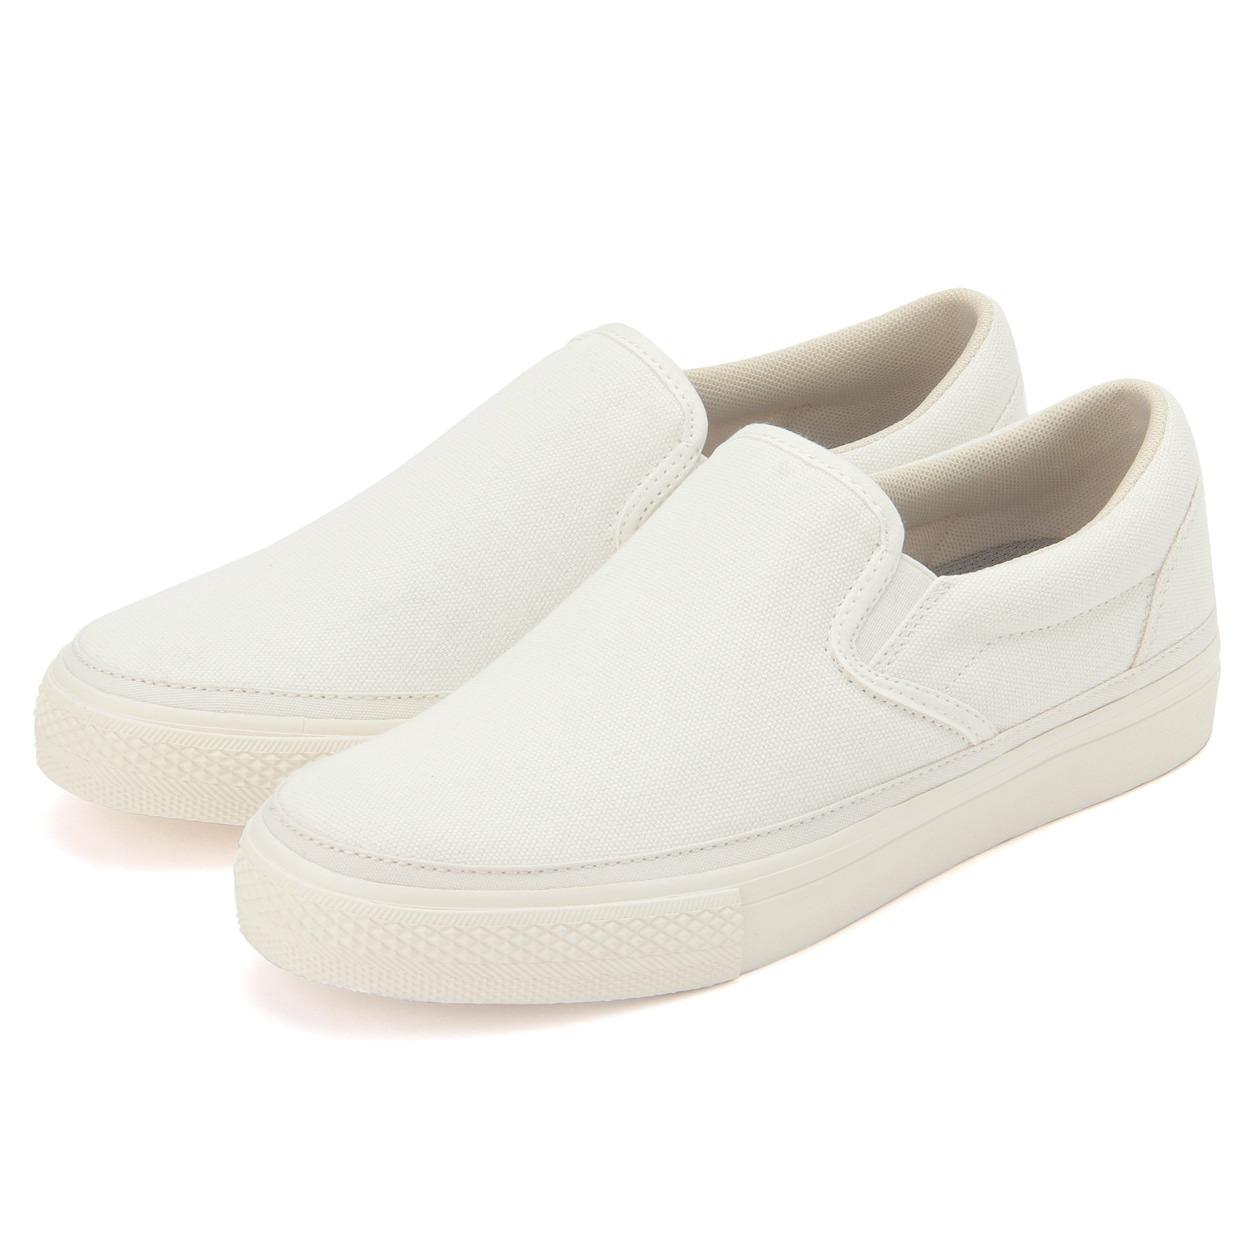 comfortable white slip on sneakers